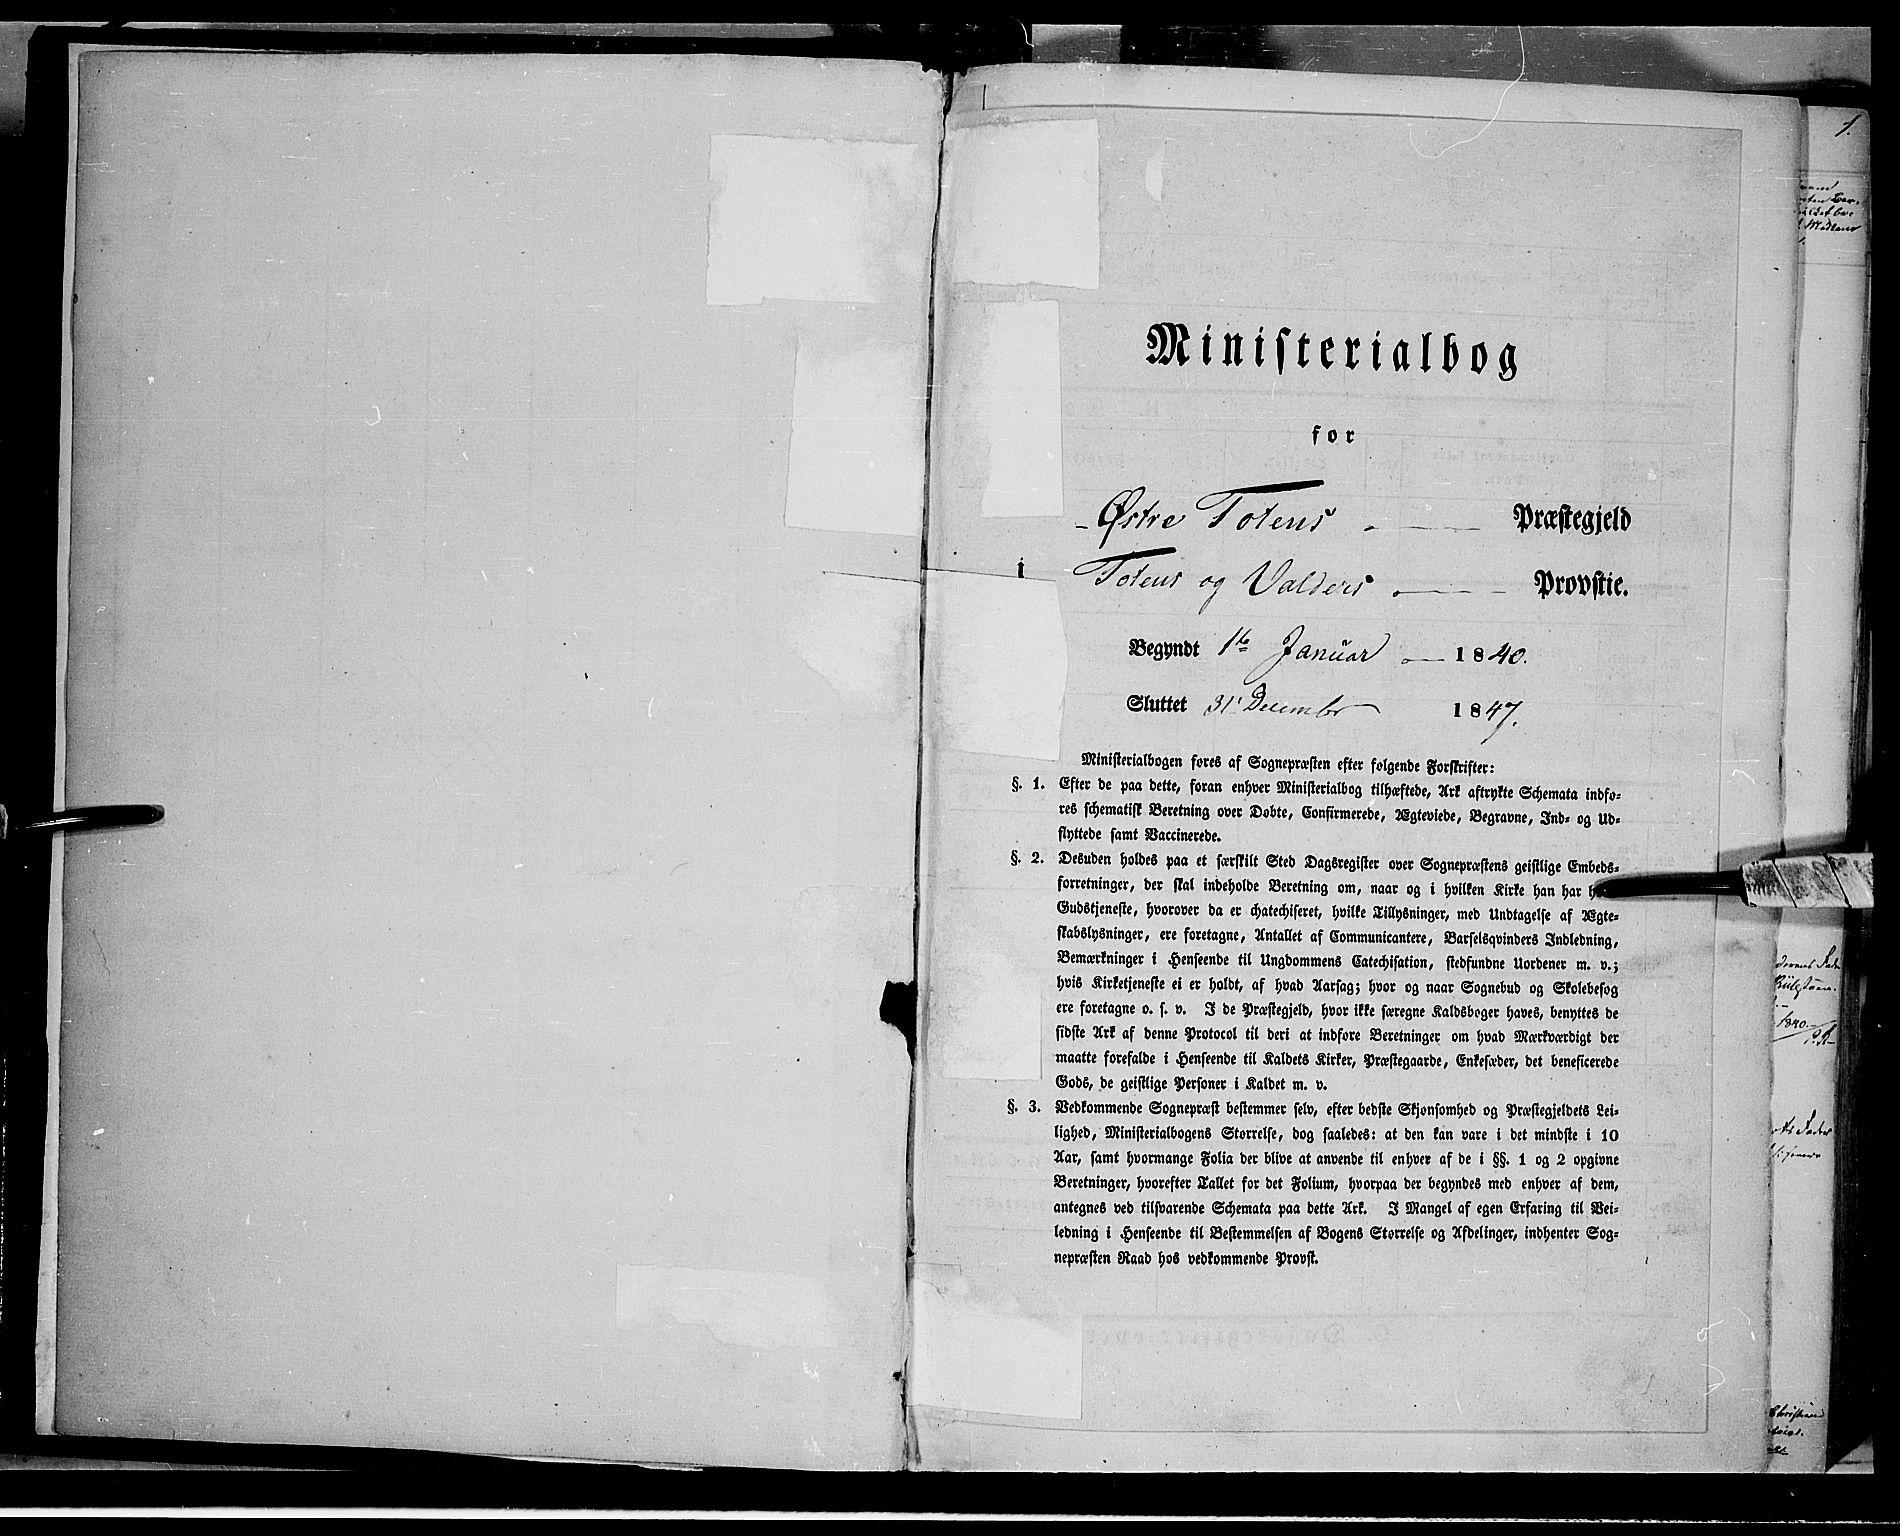 SAH, Østre Toten prestekontor, Ministerialbok nr. 2, 1840-1847